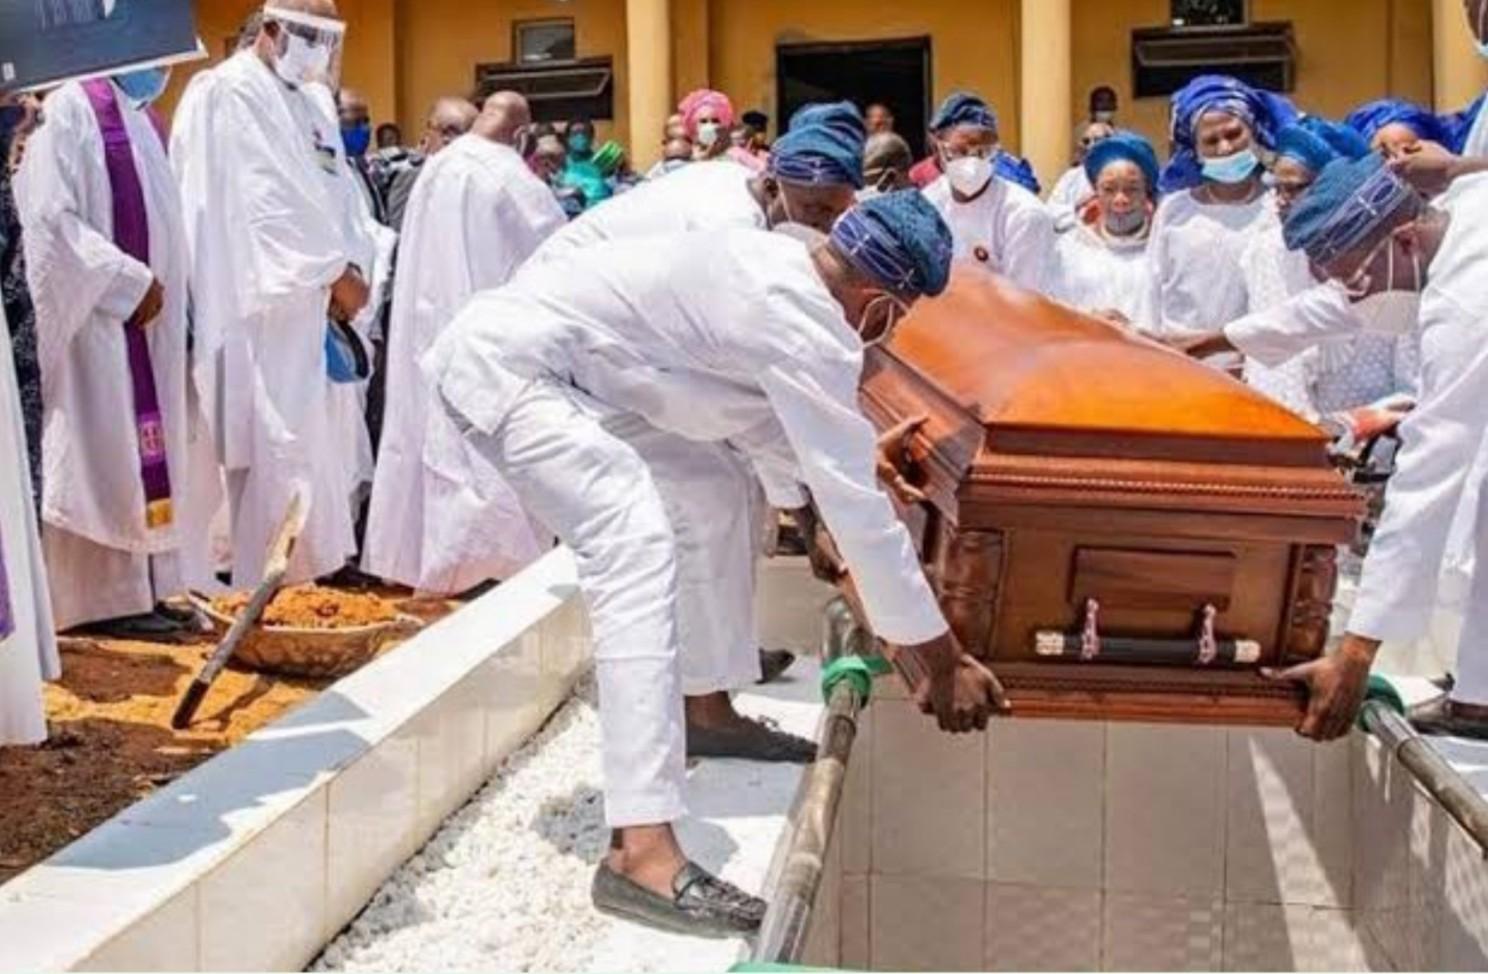 Afenifere leader, Ayo Fasanmi, buried in Ekiti home